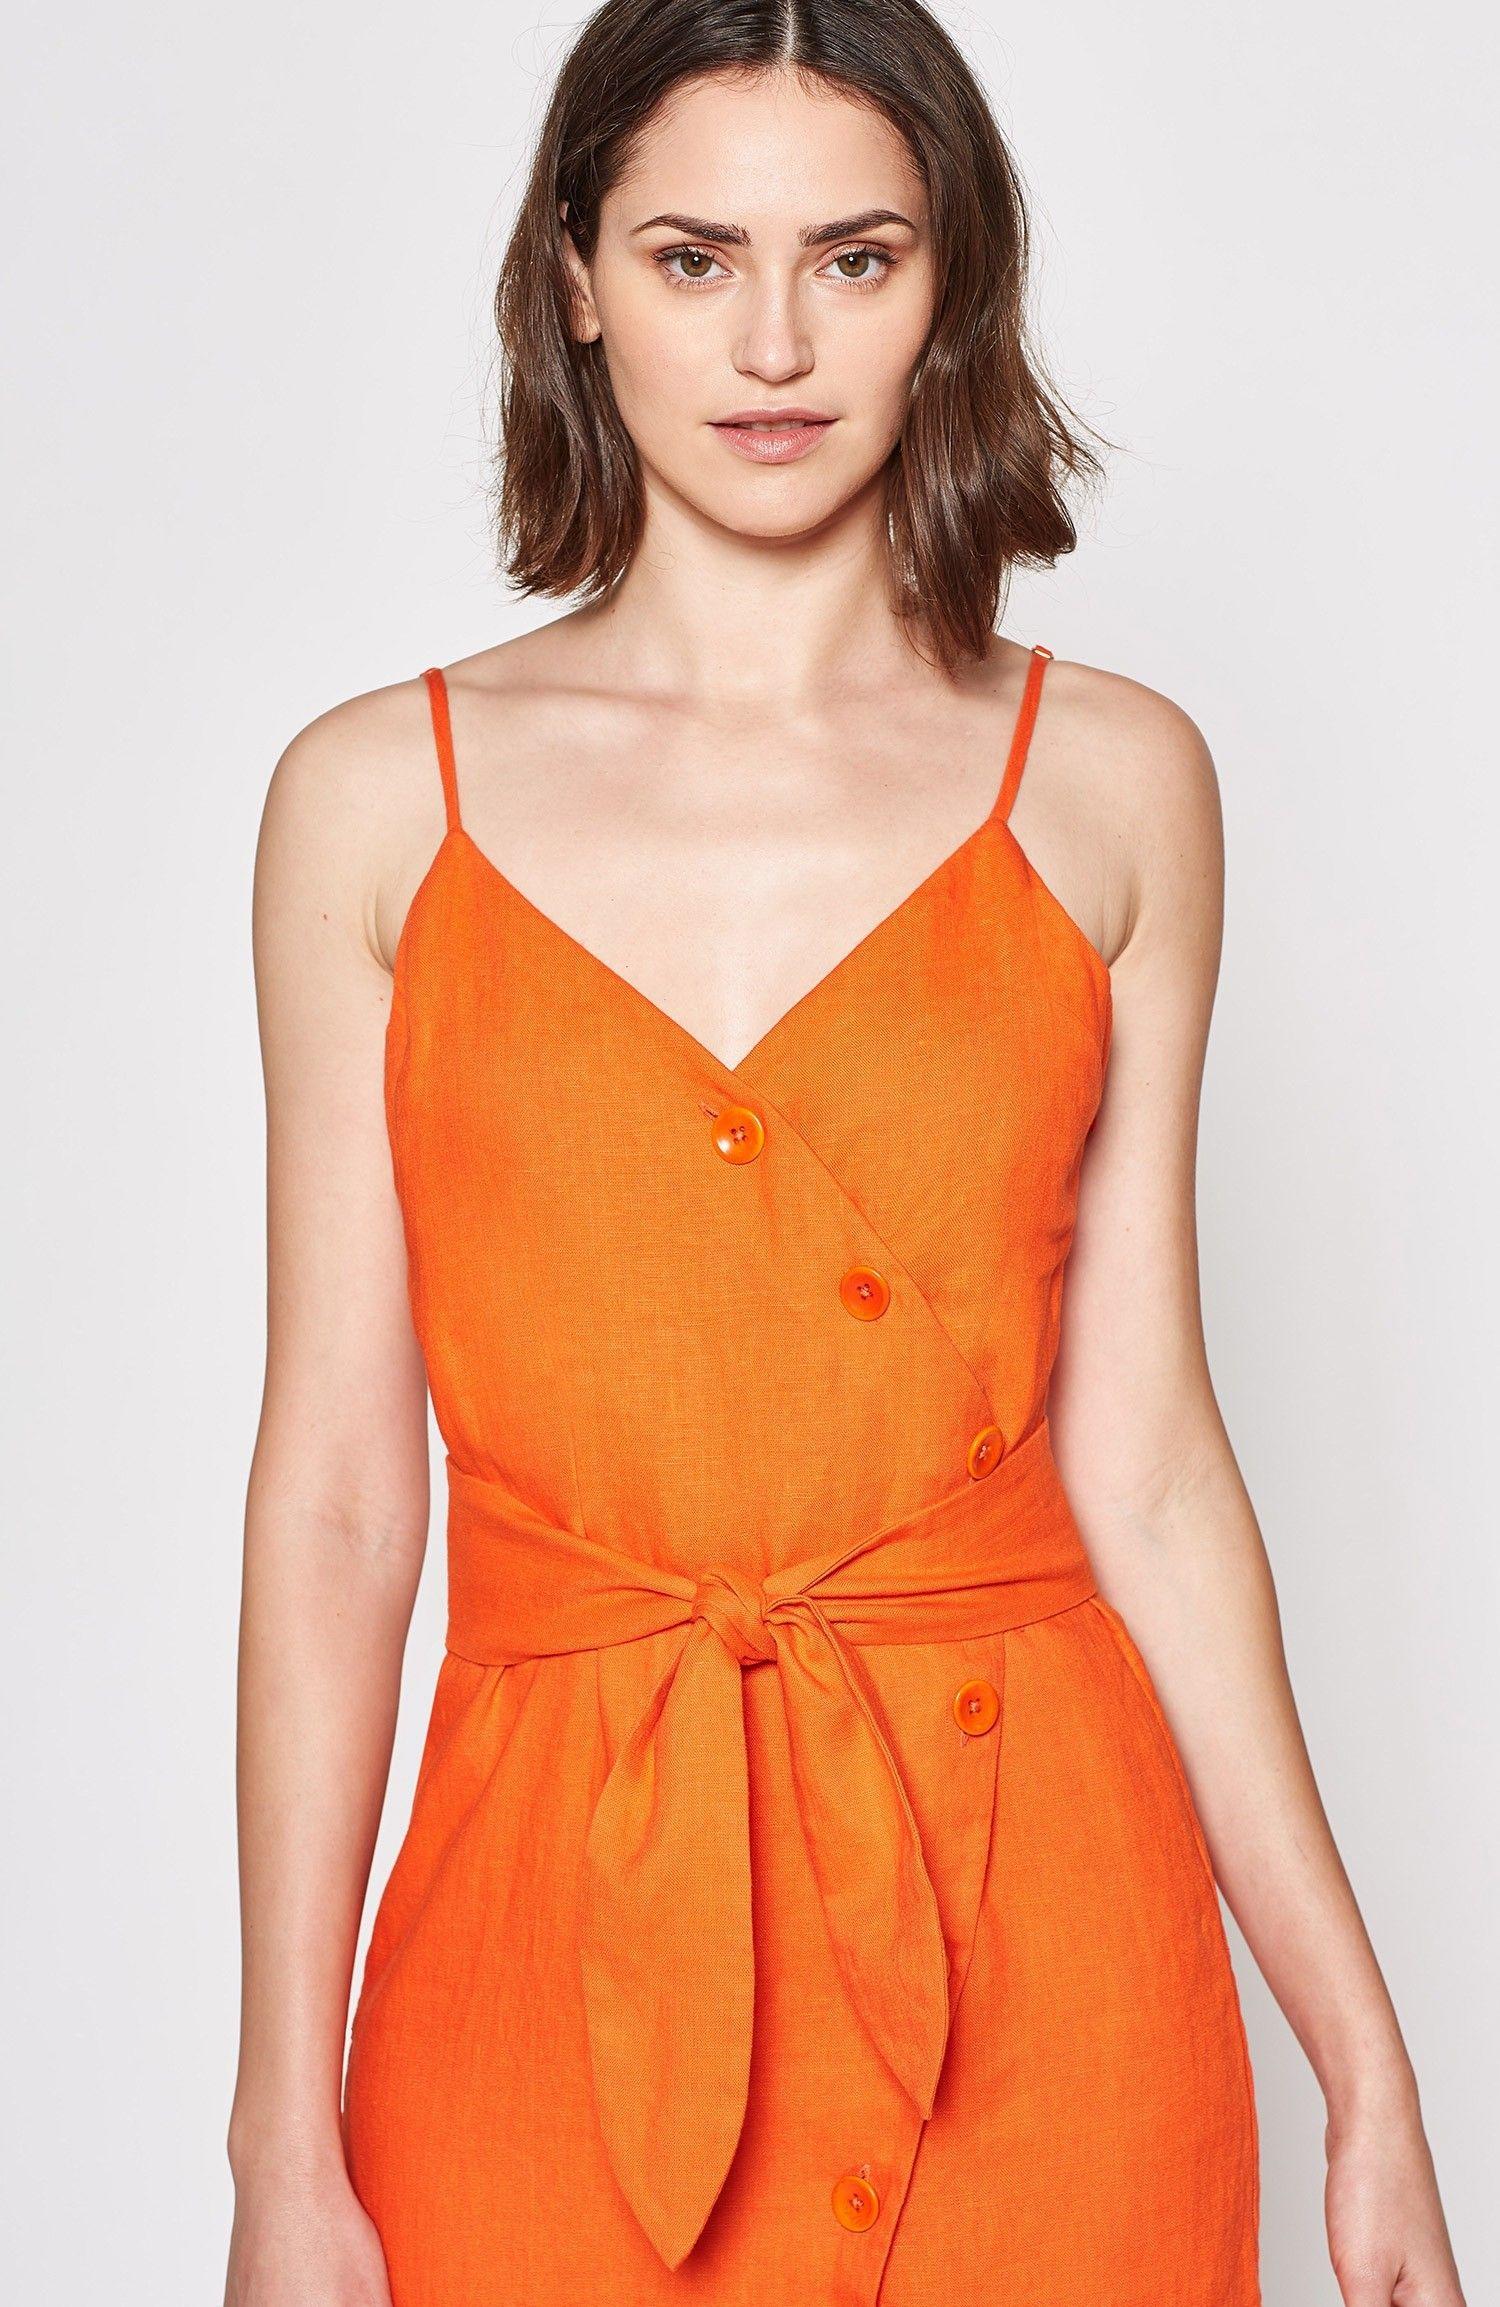 Carnell Linen Dress Warm Dresses Dresses Linen Dresses [ 2307 x 1500 Pixel ]